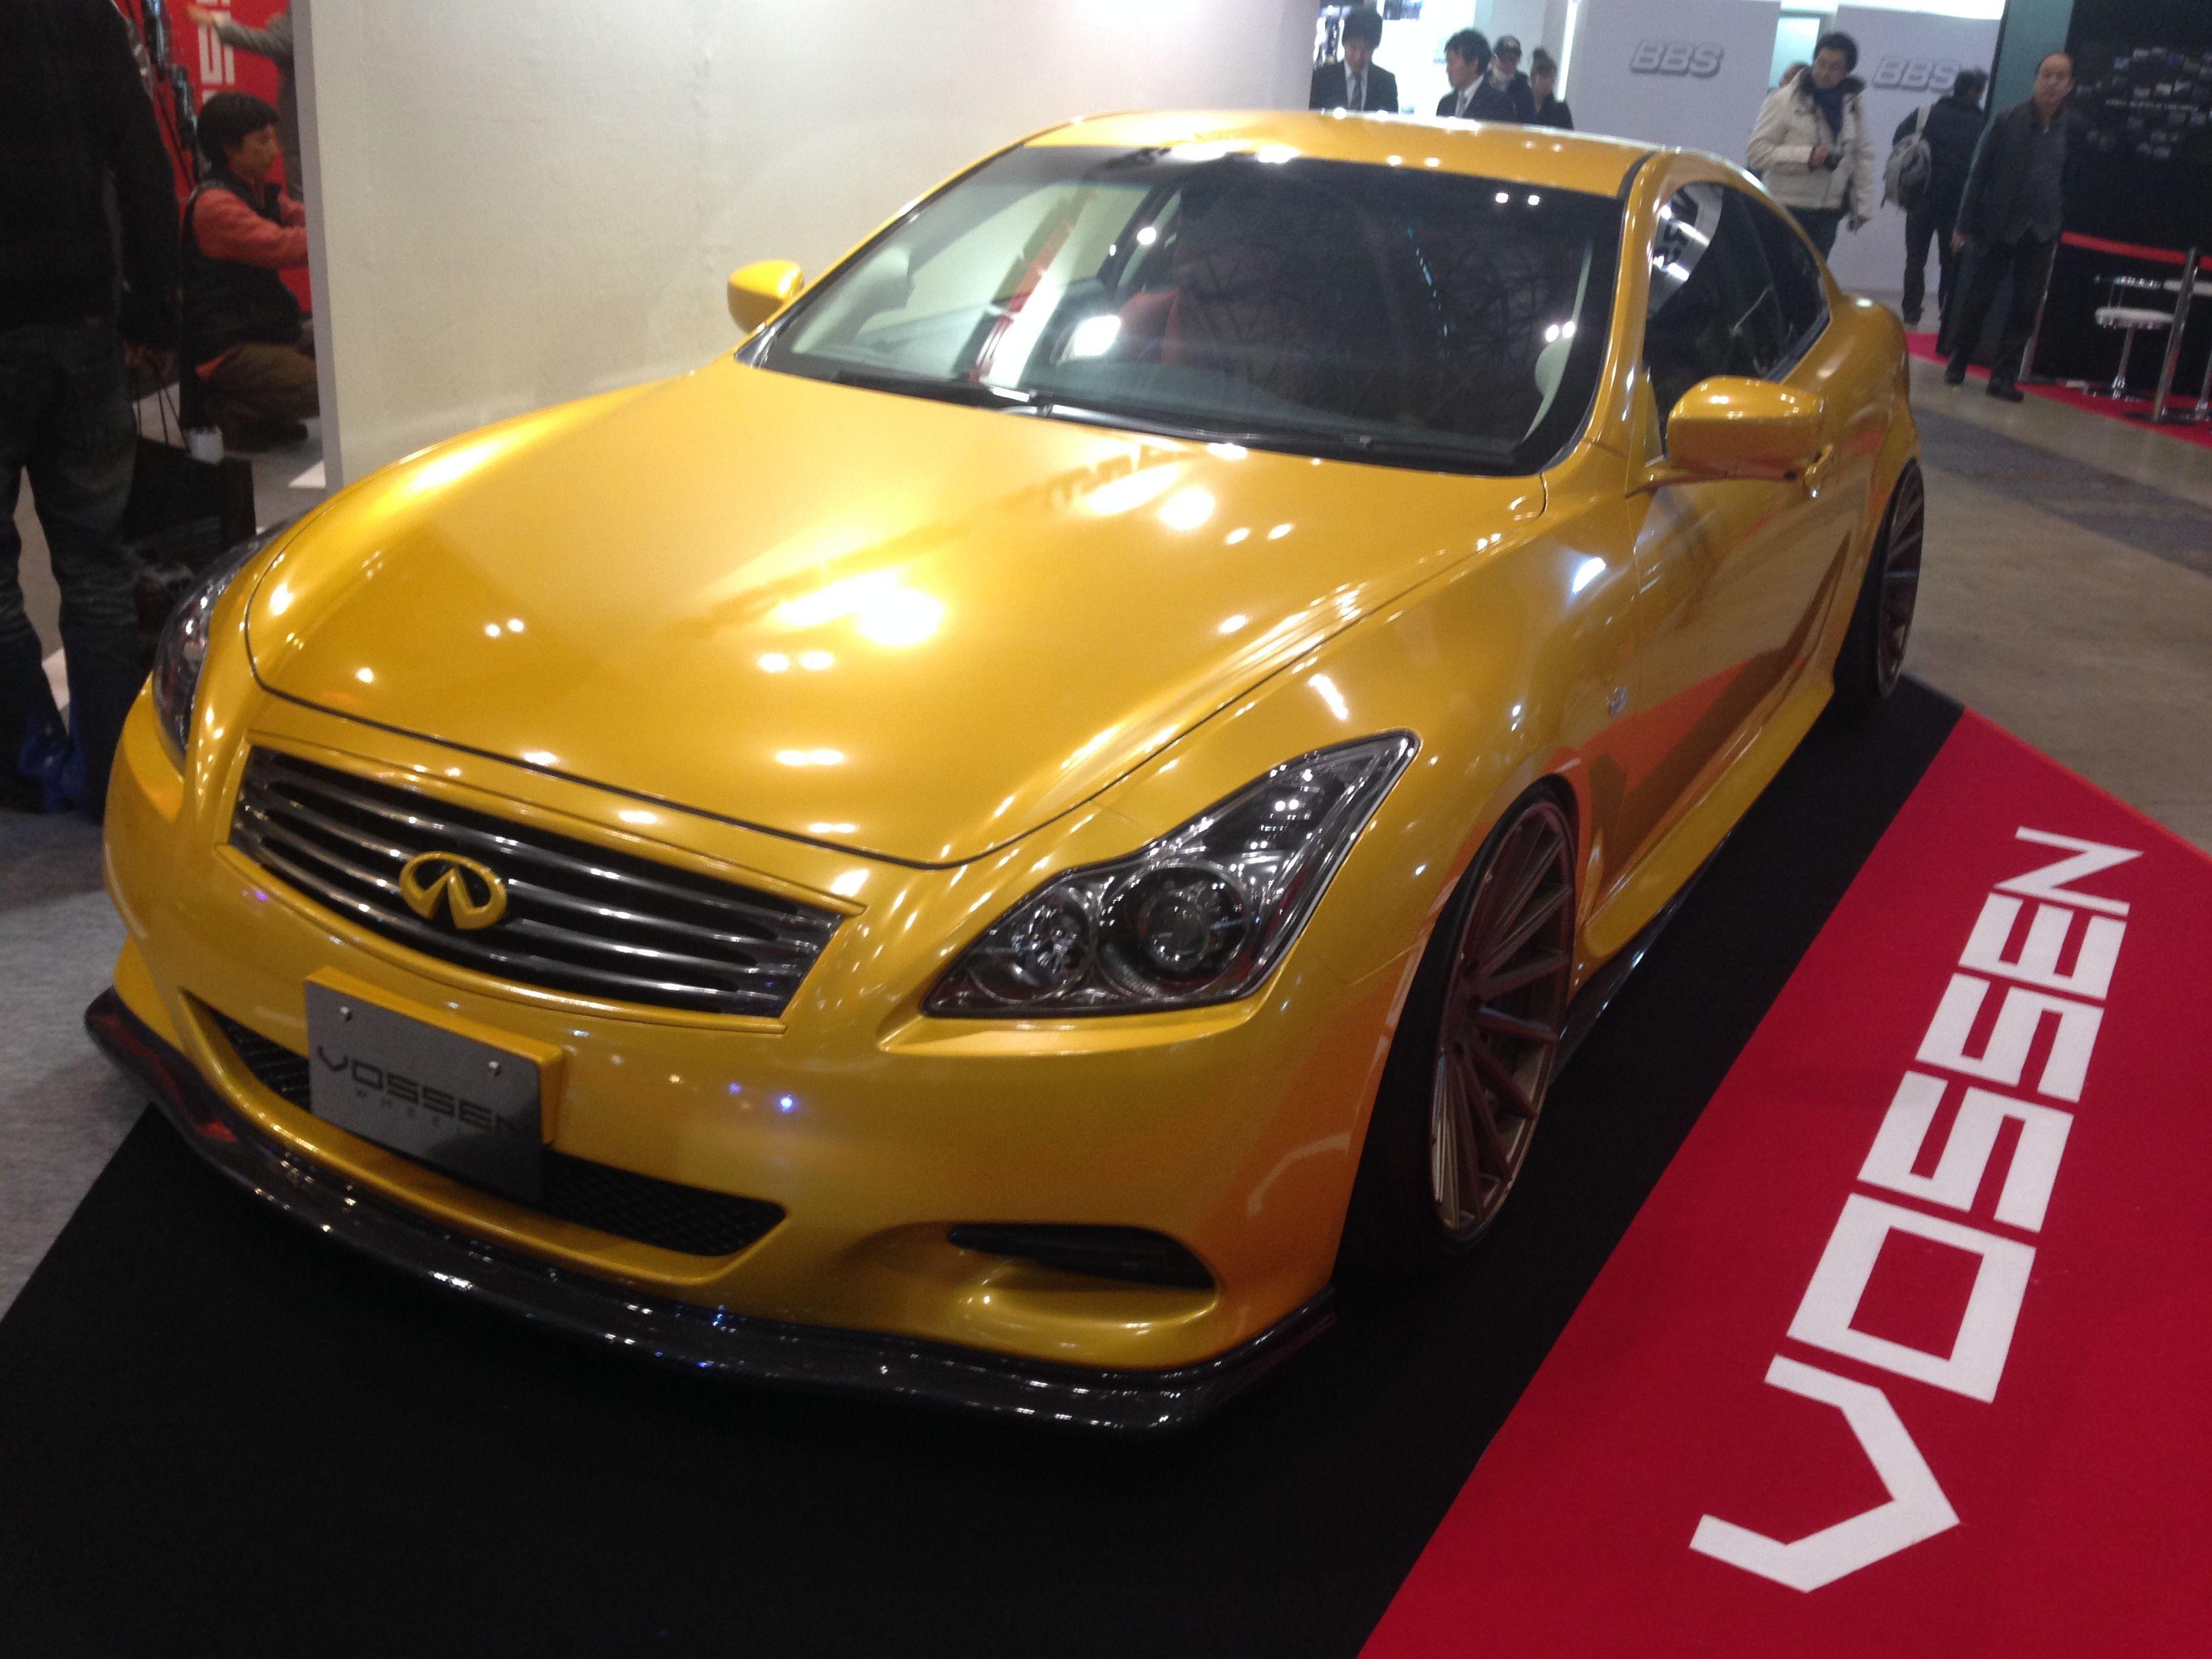 Tokyo auto salon 2014 infiniti g37 vossen world tour japan pinterest 2014 infiniti g37 infiniti g37 and q50